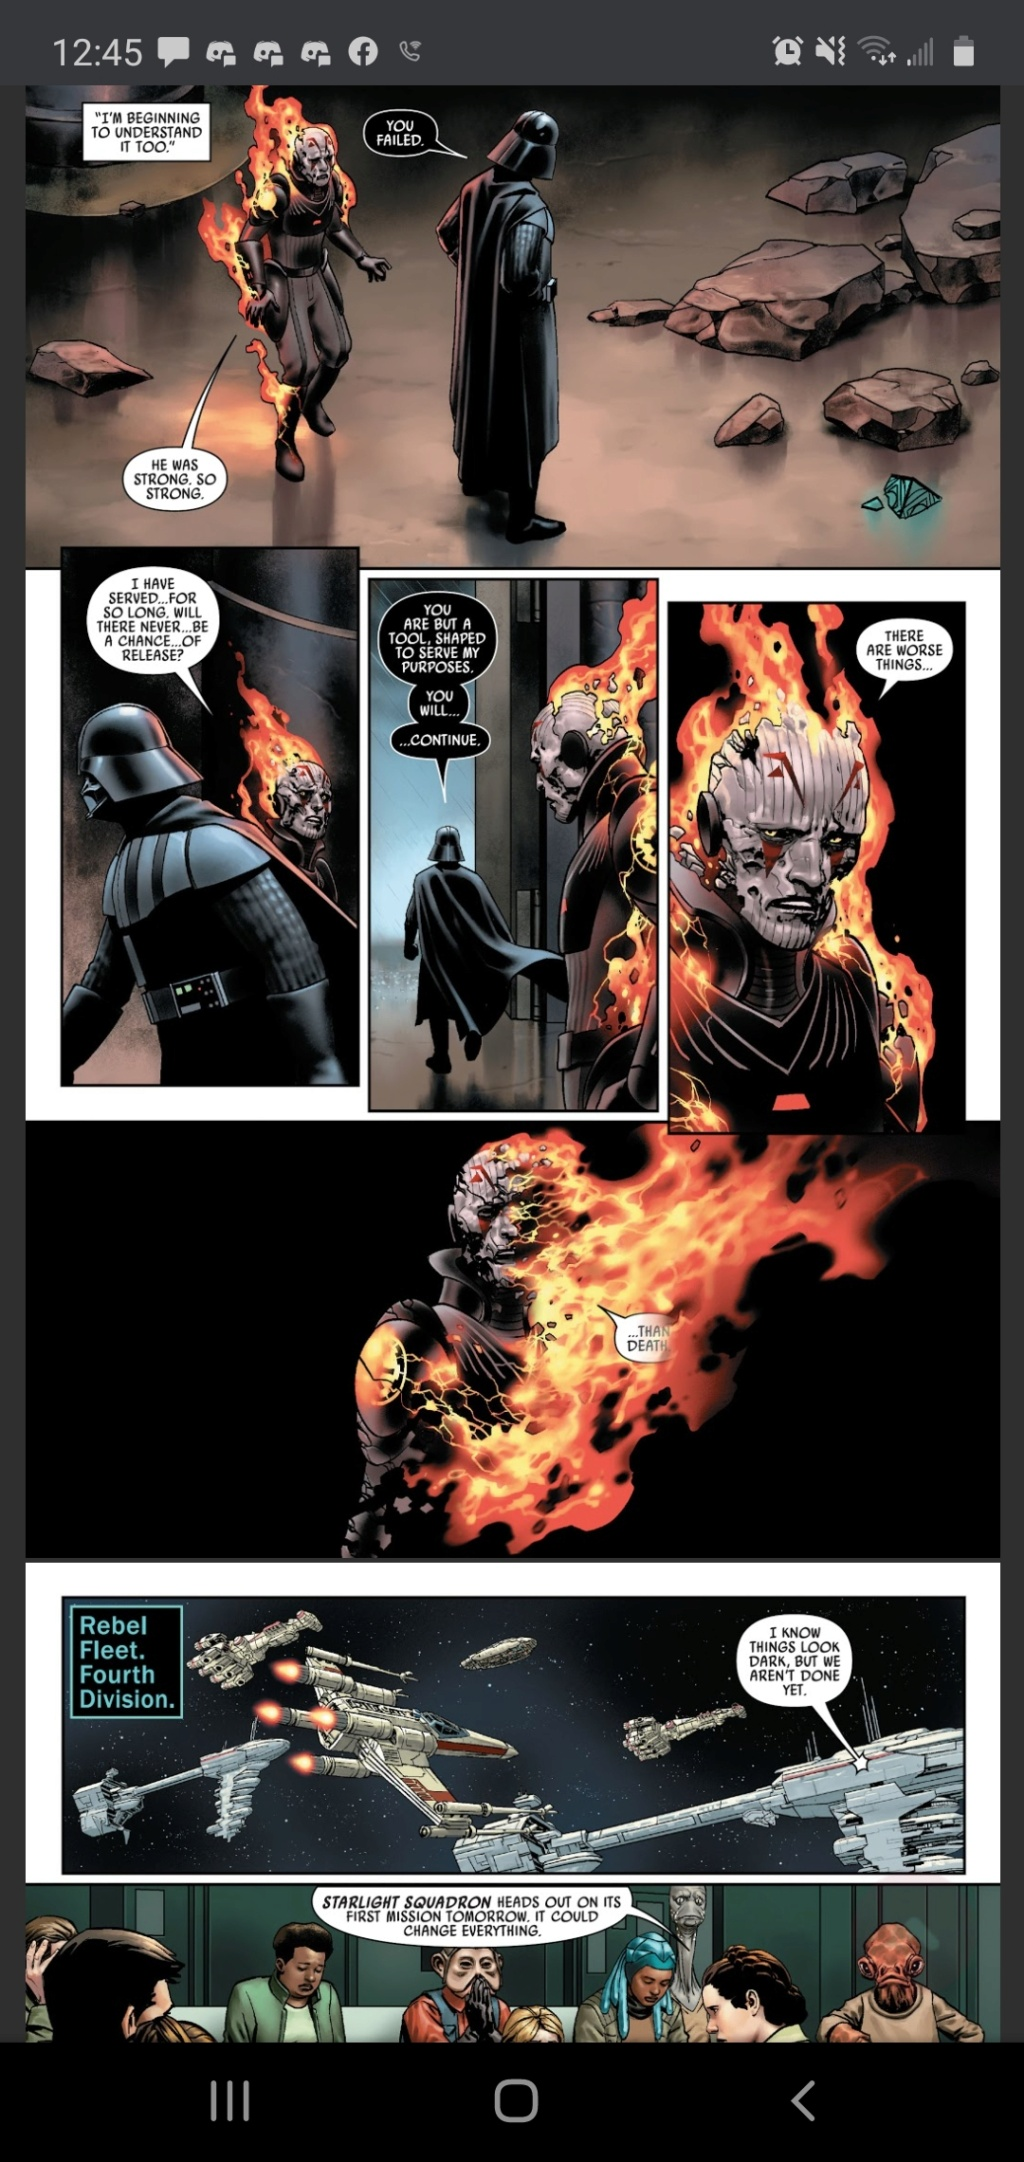 ESB Luke beat the Grand Inquisitor Screen12